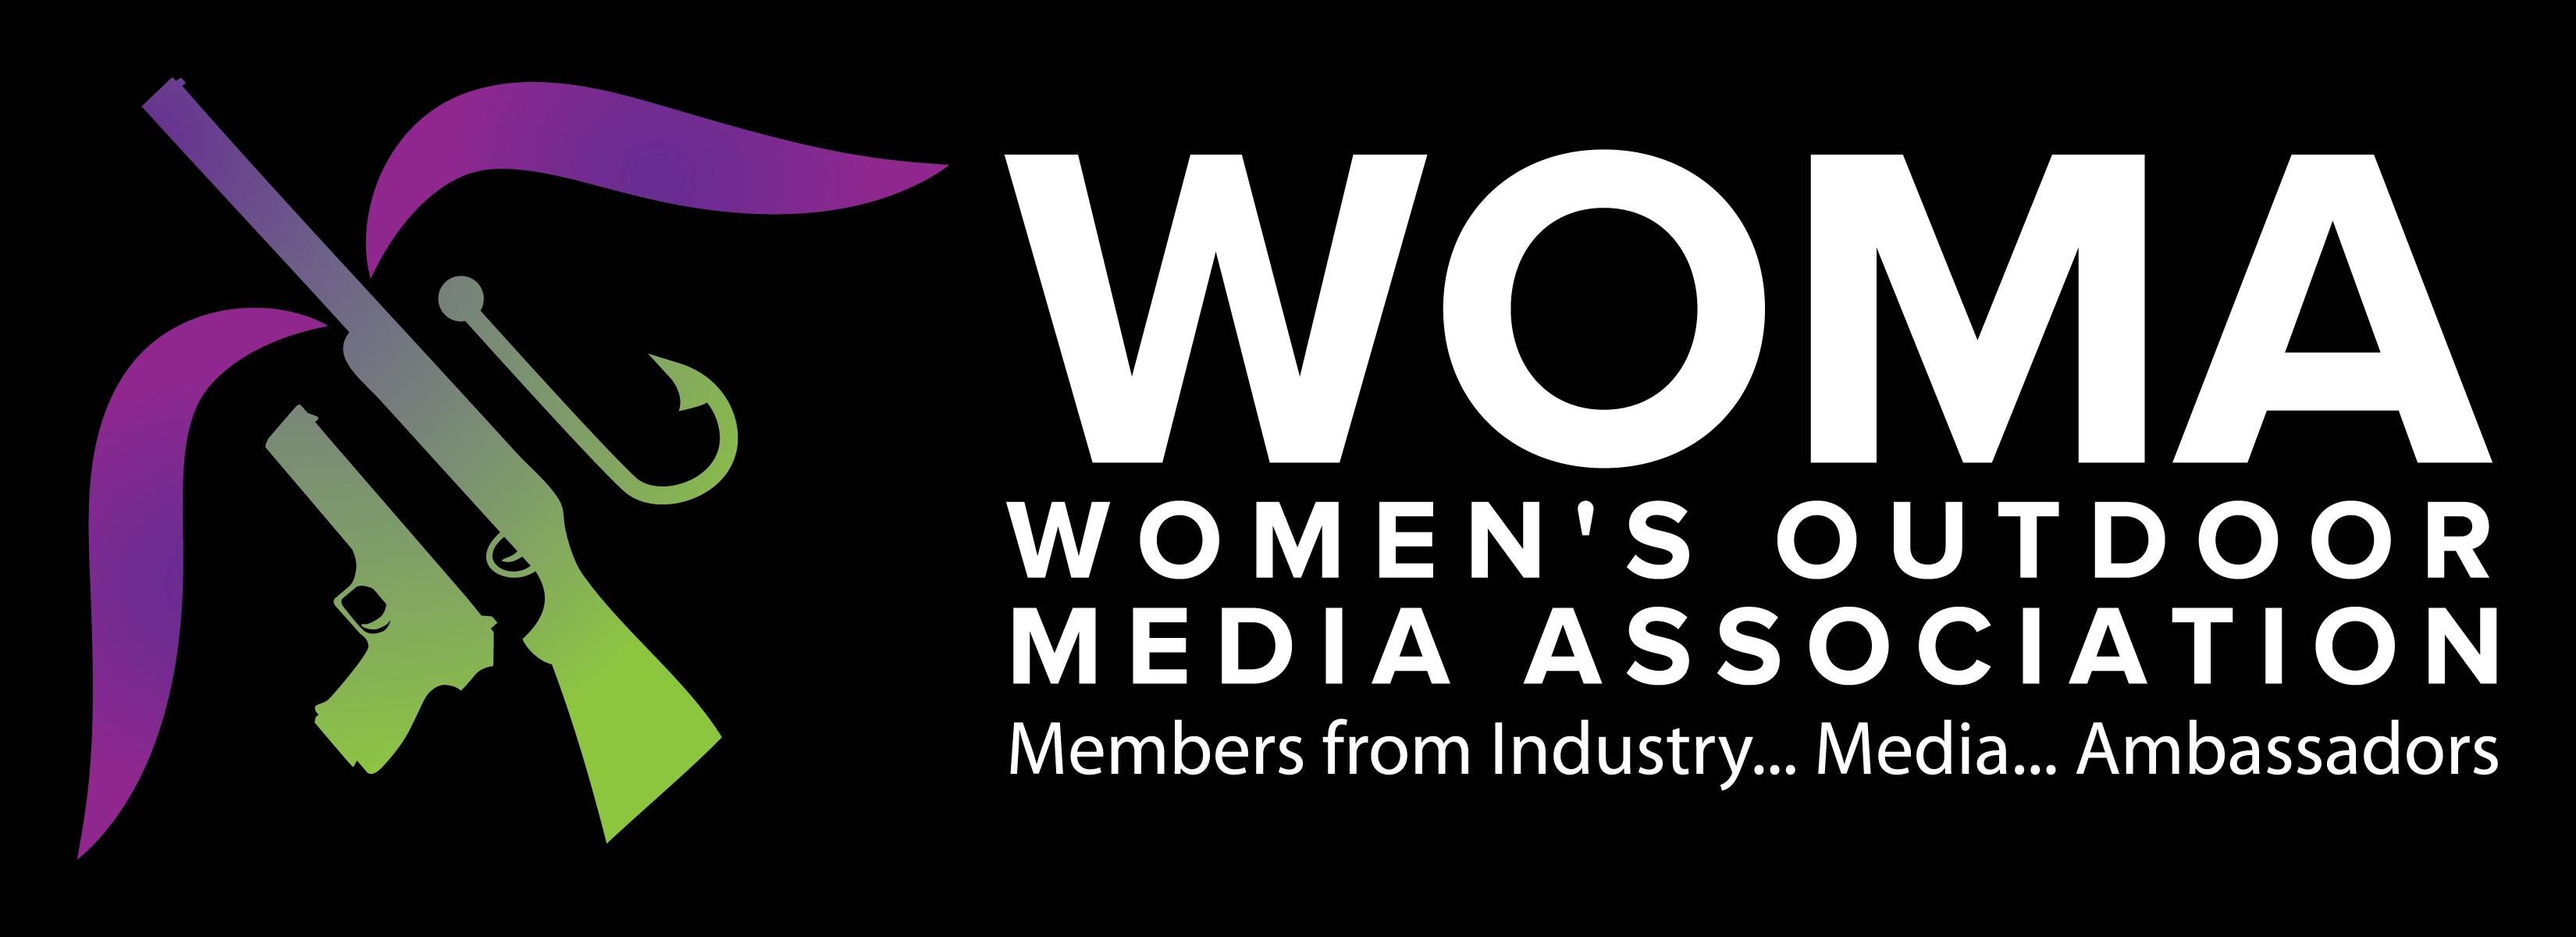 Women's Outdoor Media Association